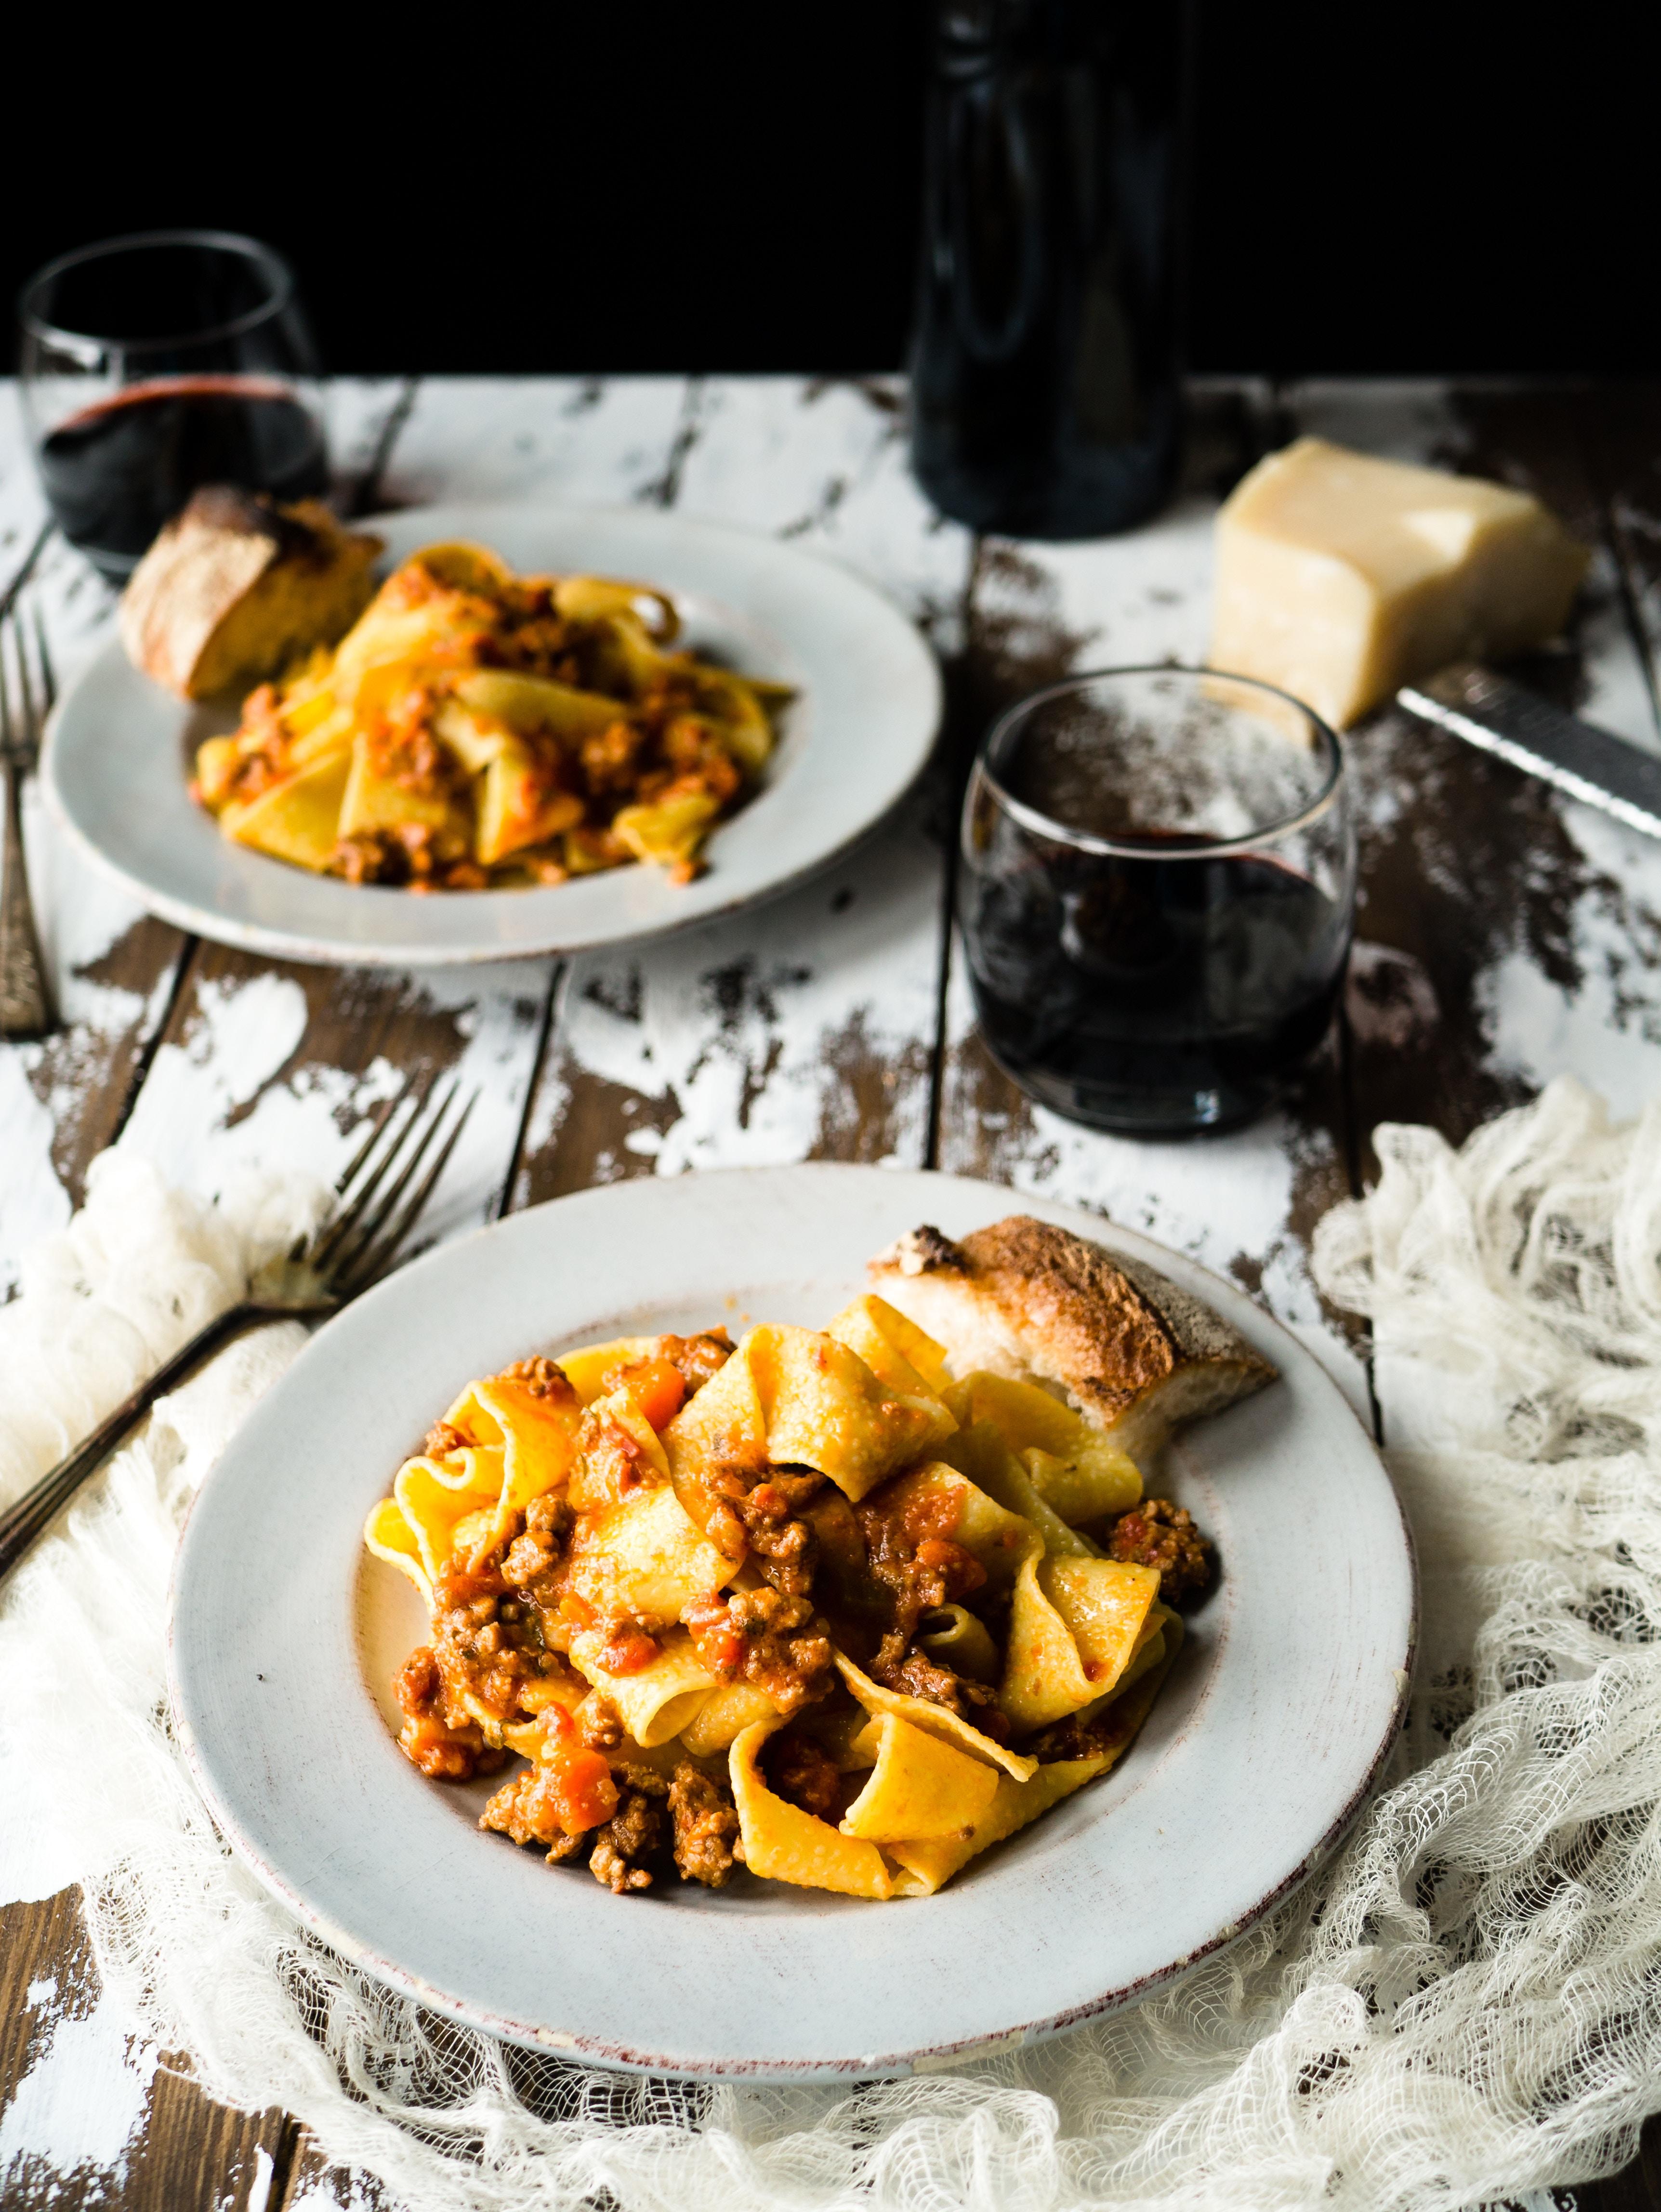 Rome, Italy Restaurants: Best Local Cuisine